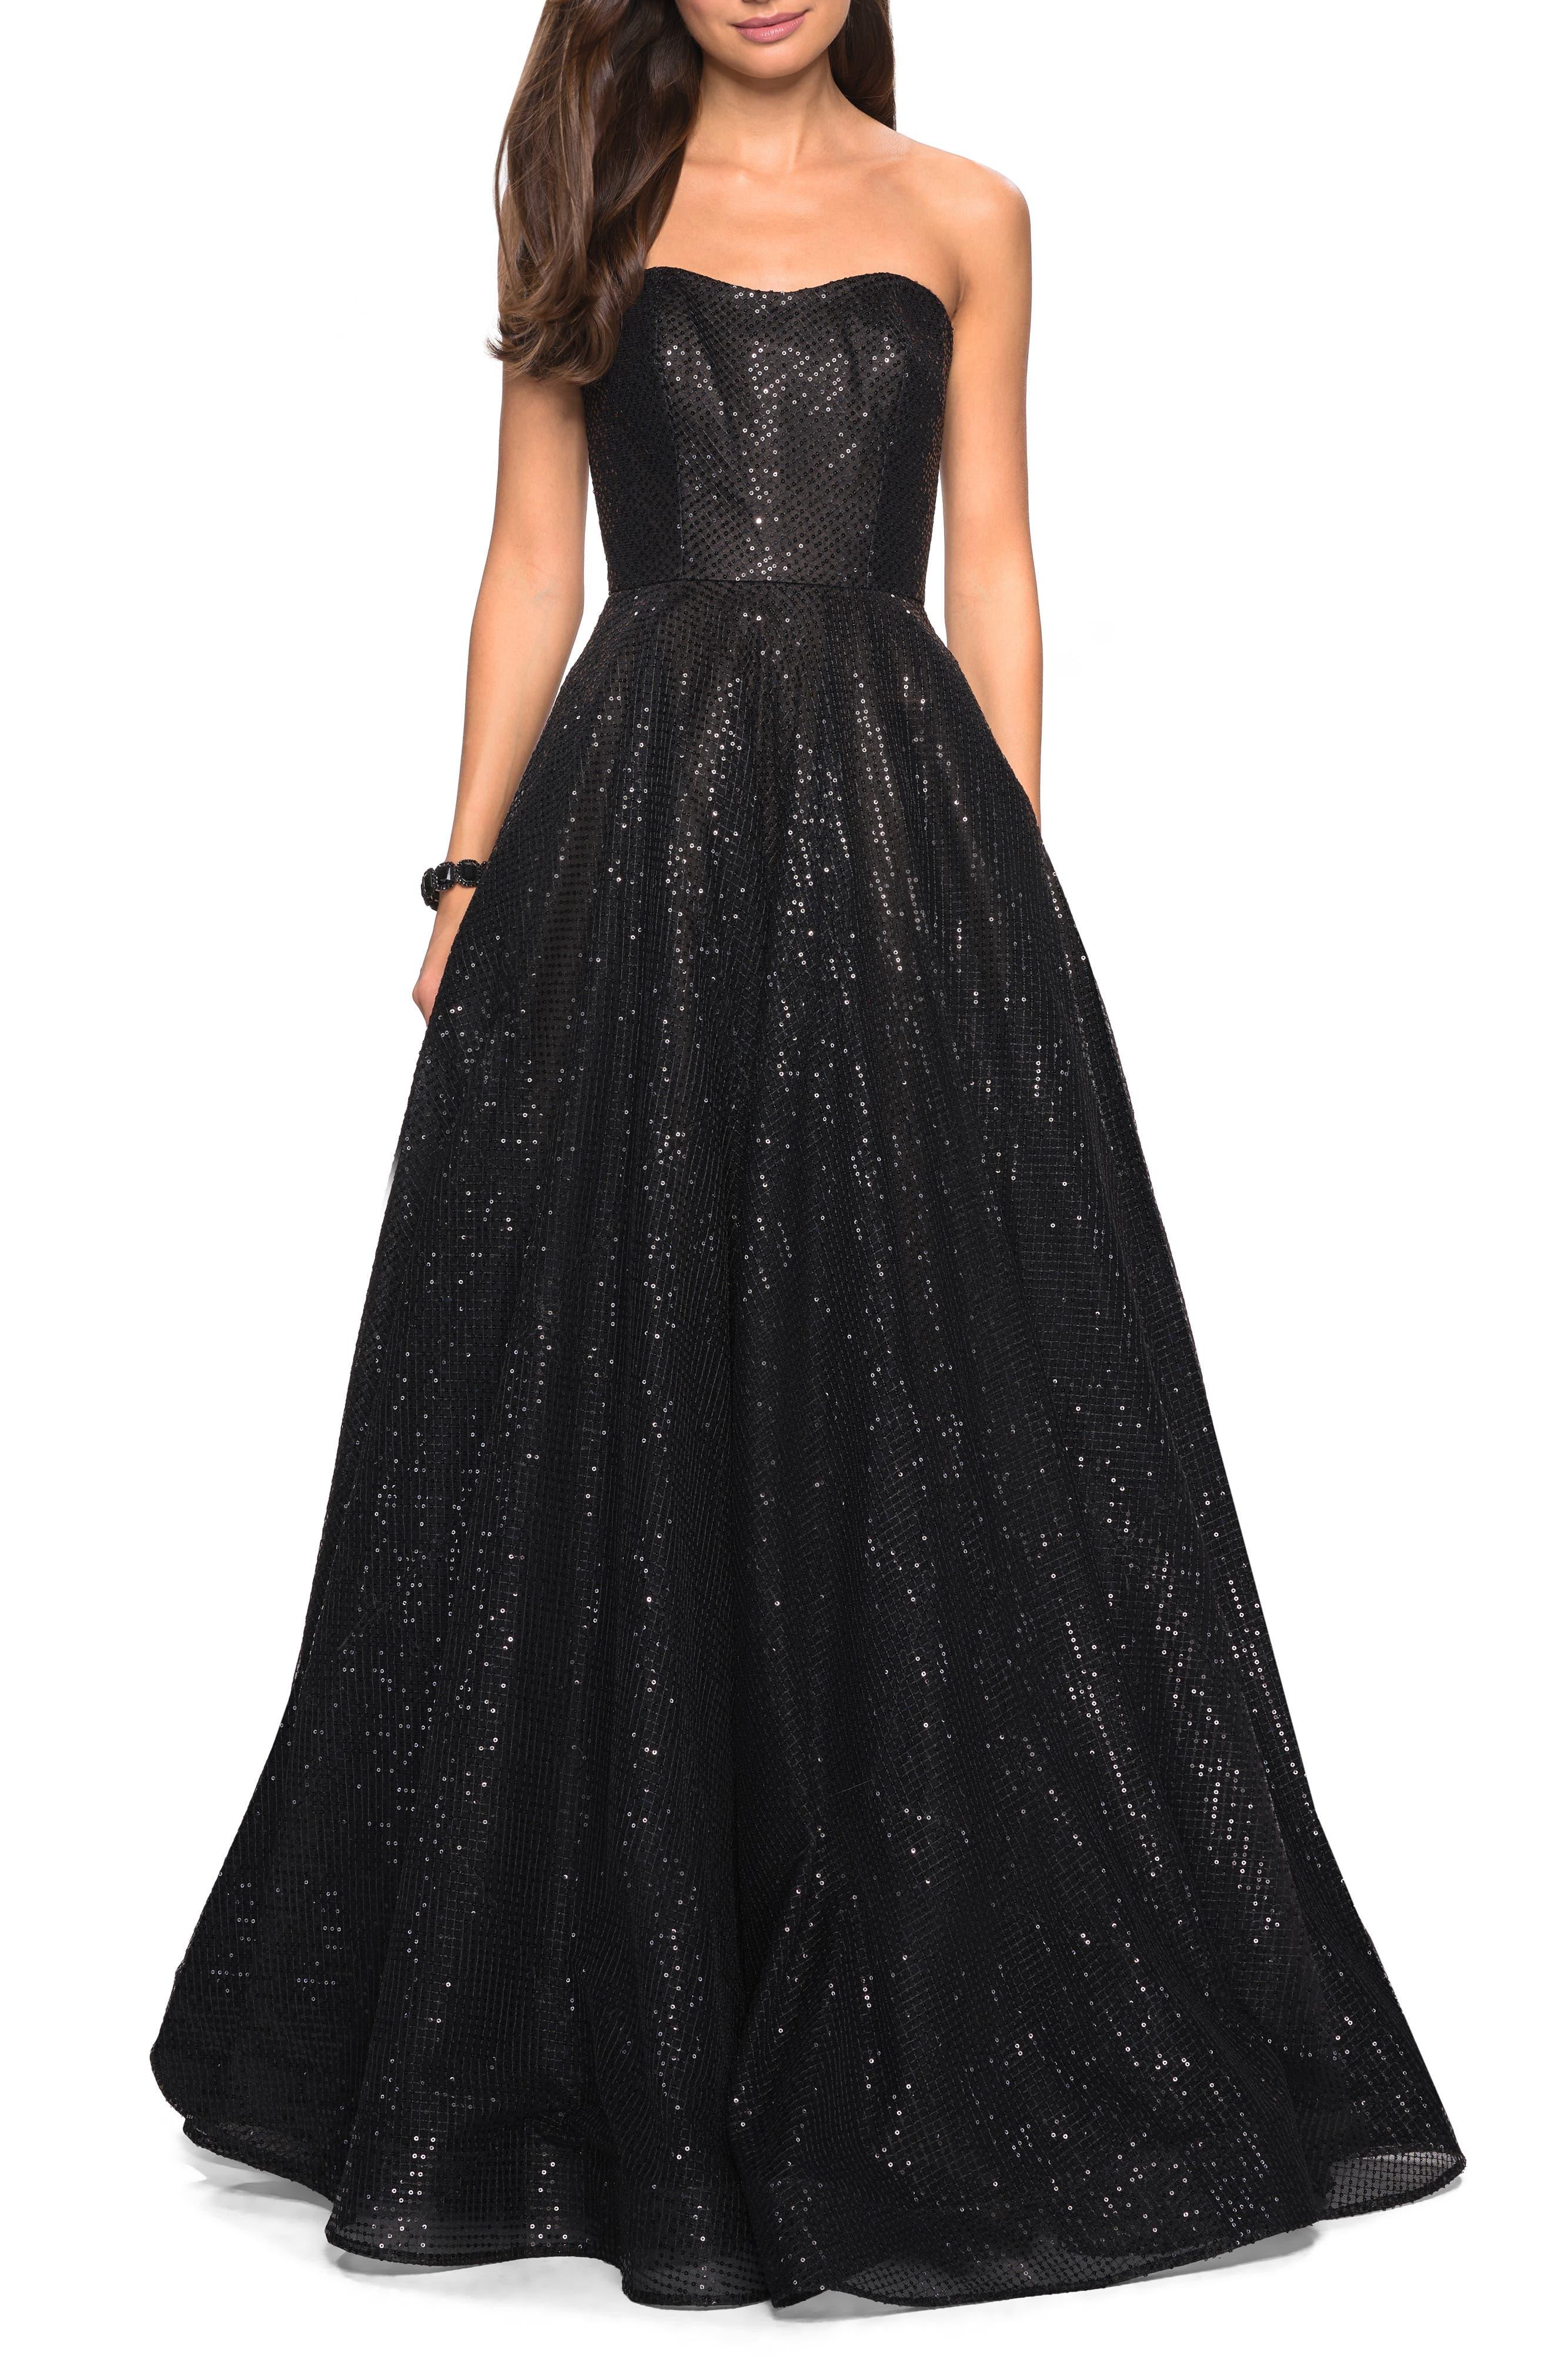 La Femme Sequin Strapless Evening Dress, Black